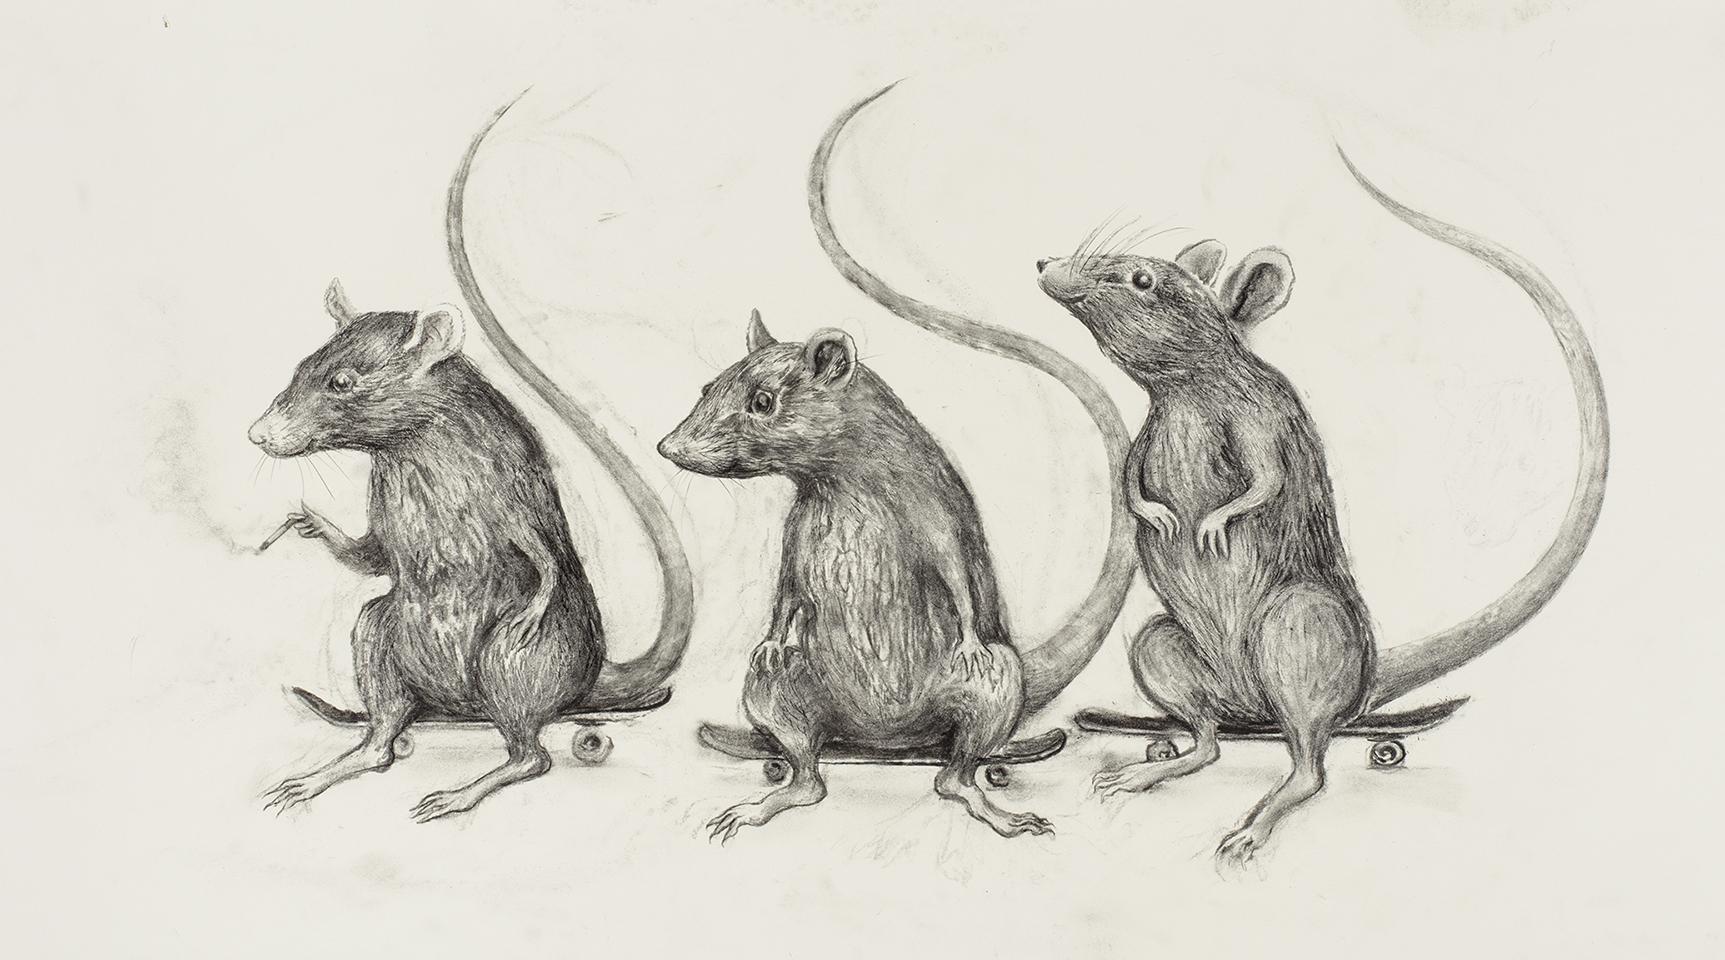 Skate Rats